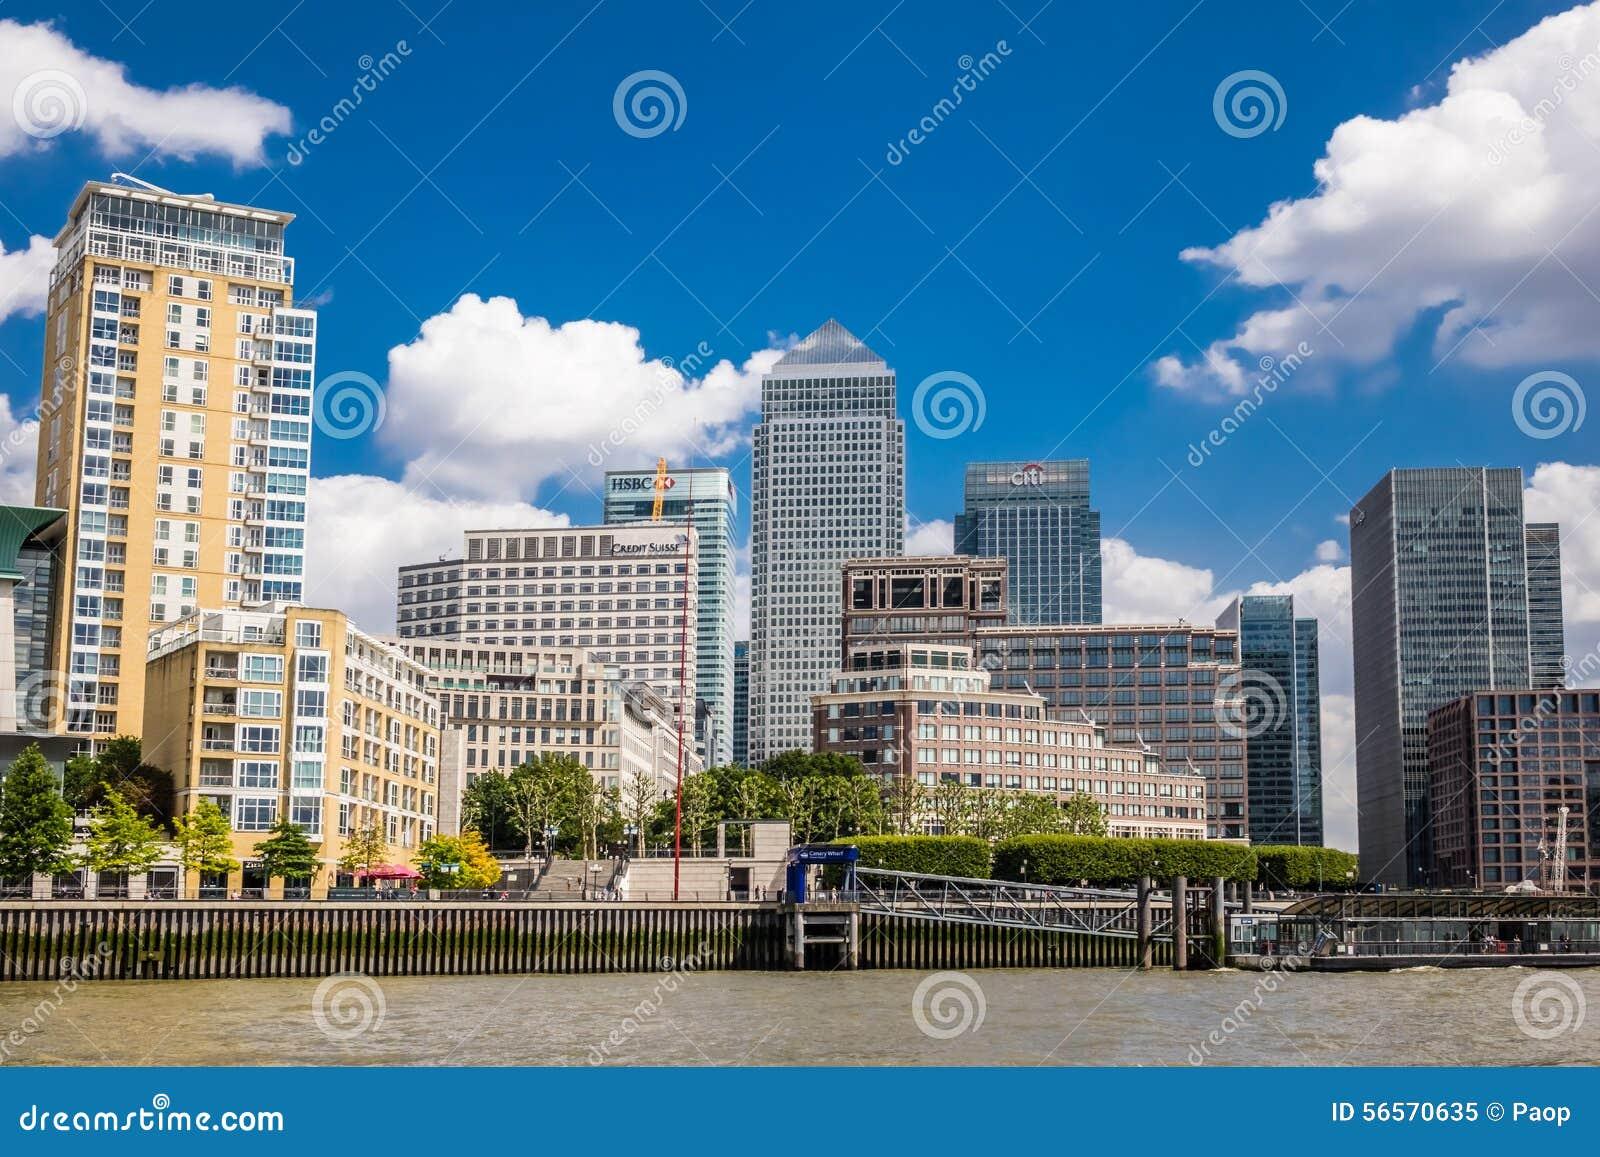 Download Ορίζοντας Canary Wharf εκδοτική εικόνα. εικόνα από εξωτερικό - 56570635